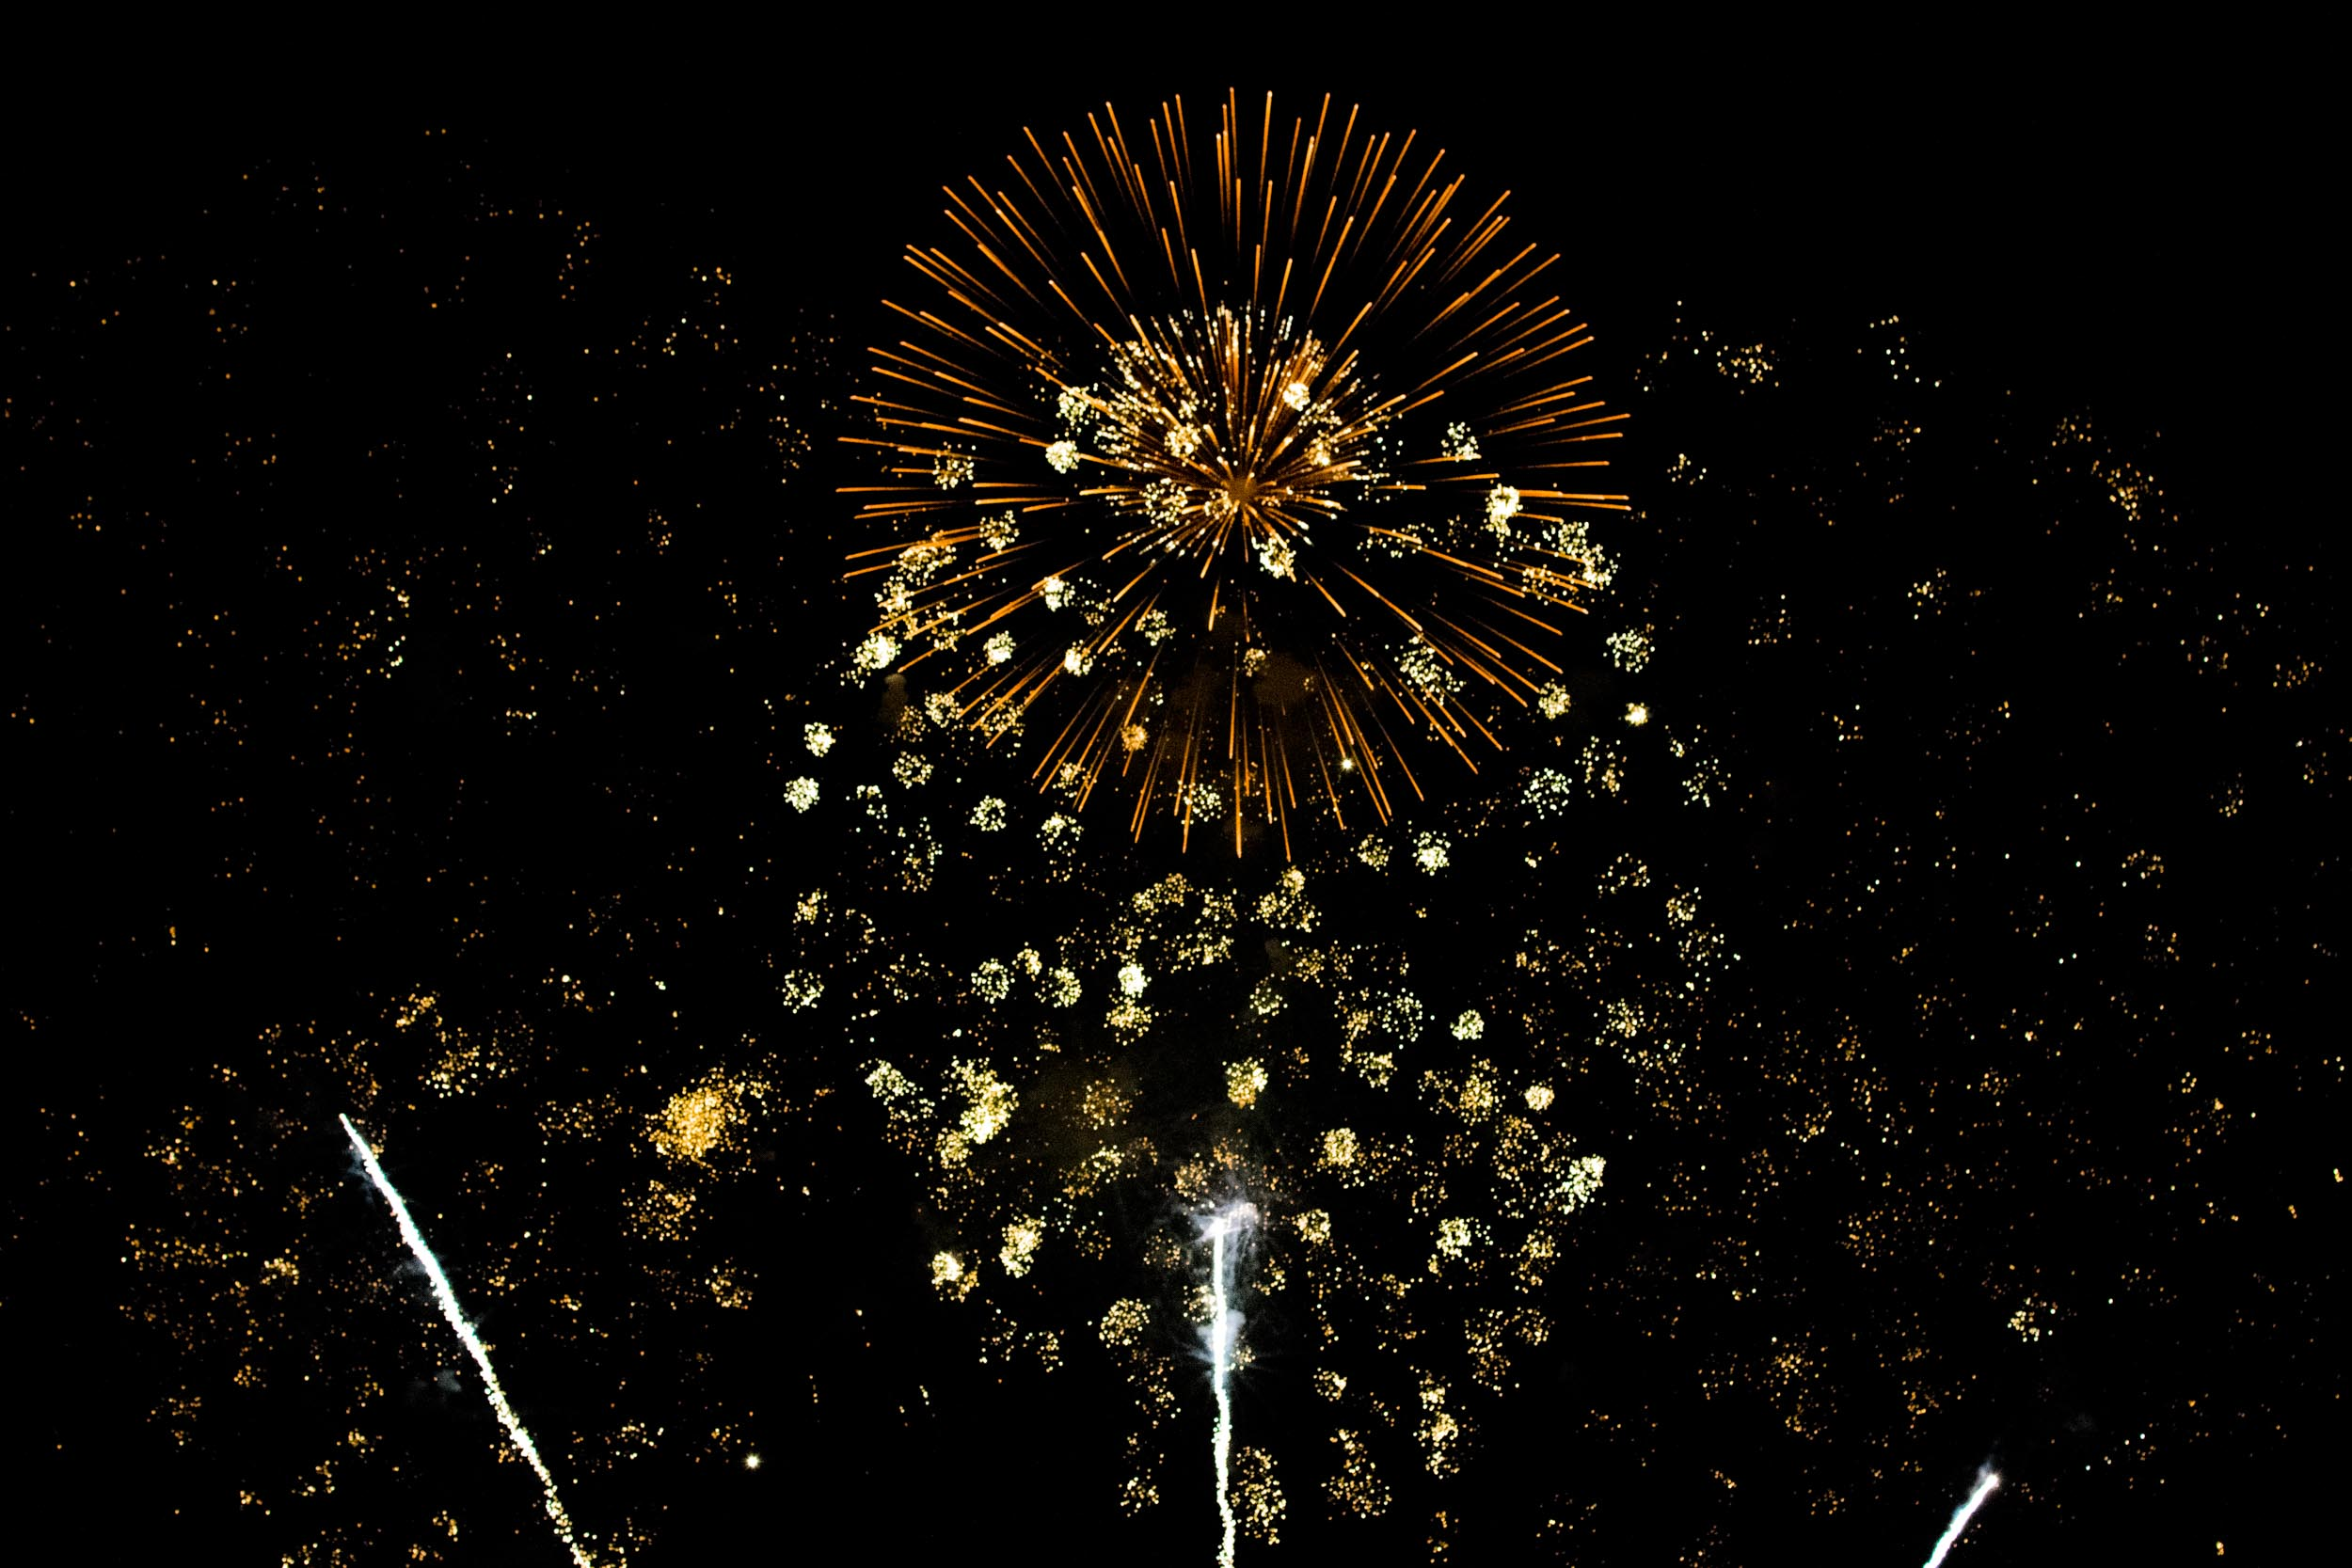 Fireworks, BC. 2017